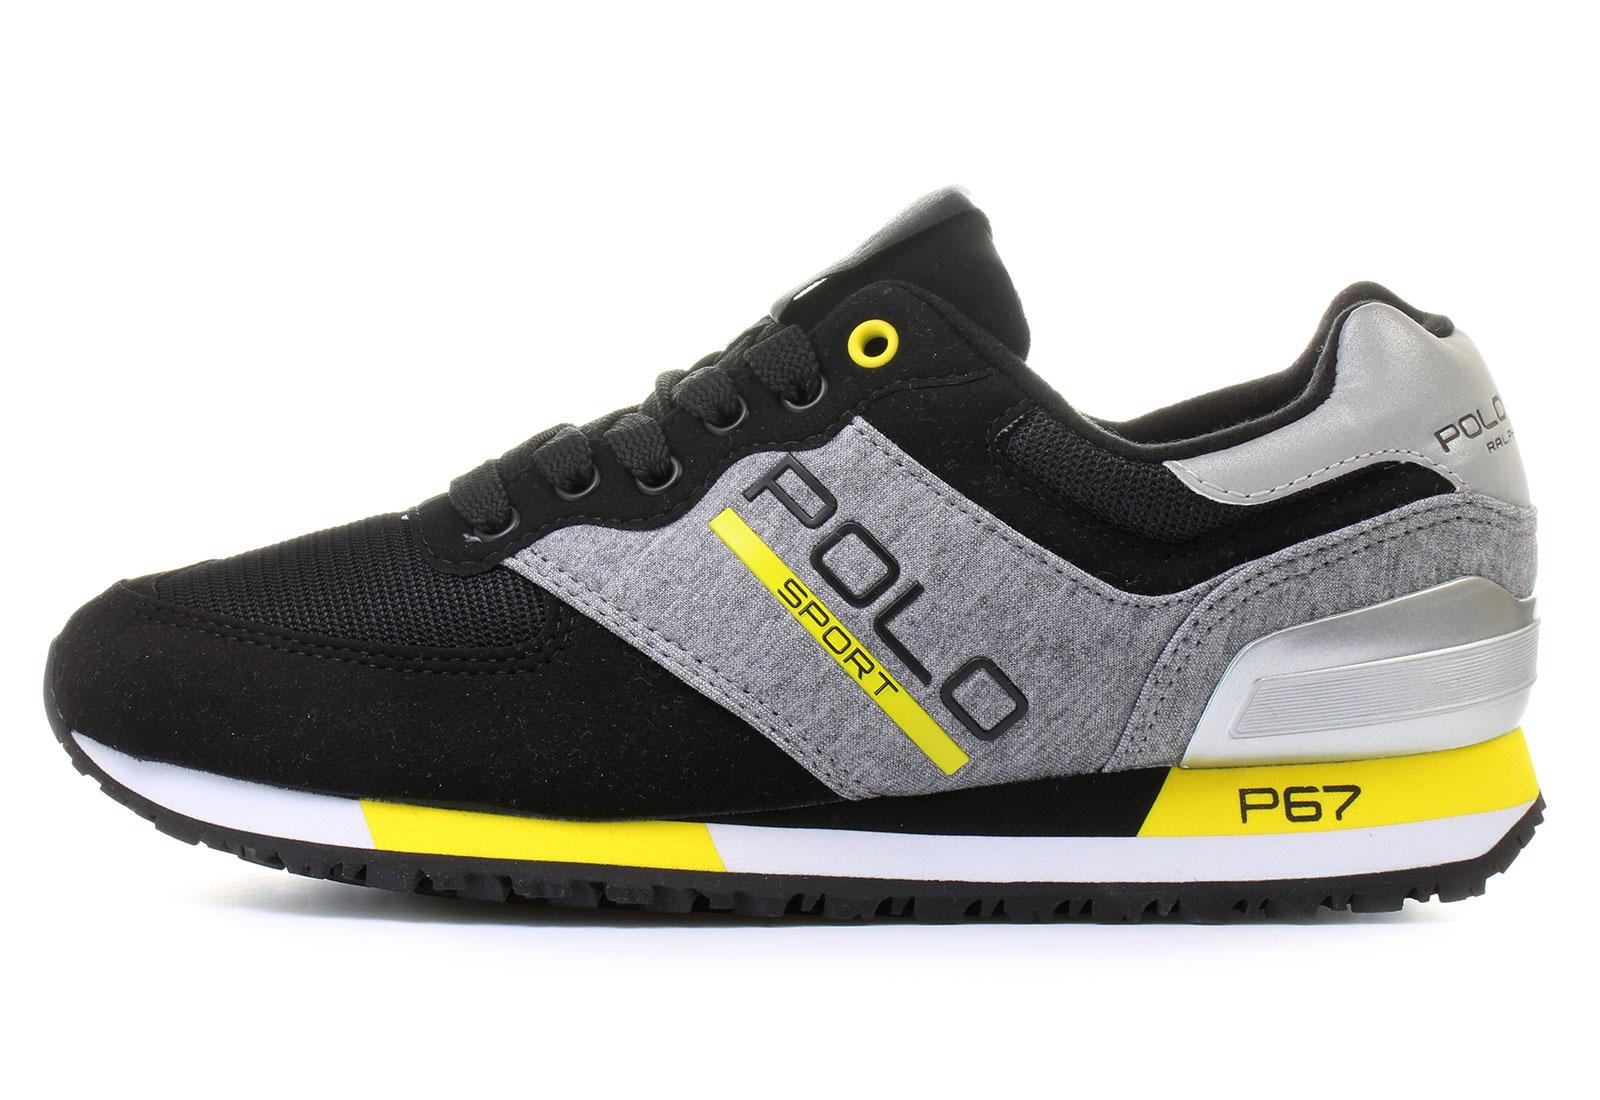 Polo Ralph Lauren Cipő - Slaton Polo - Z07C-X-XW0M5 - Office Shoes ... 317b6864d6